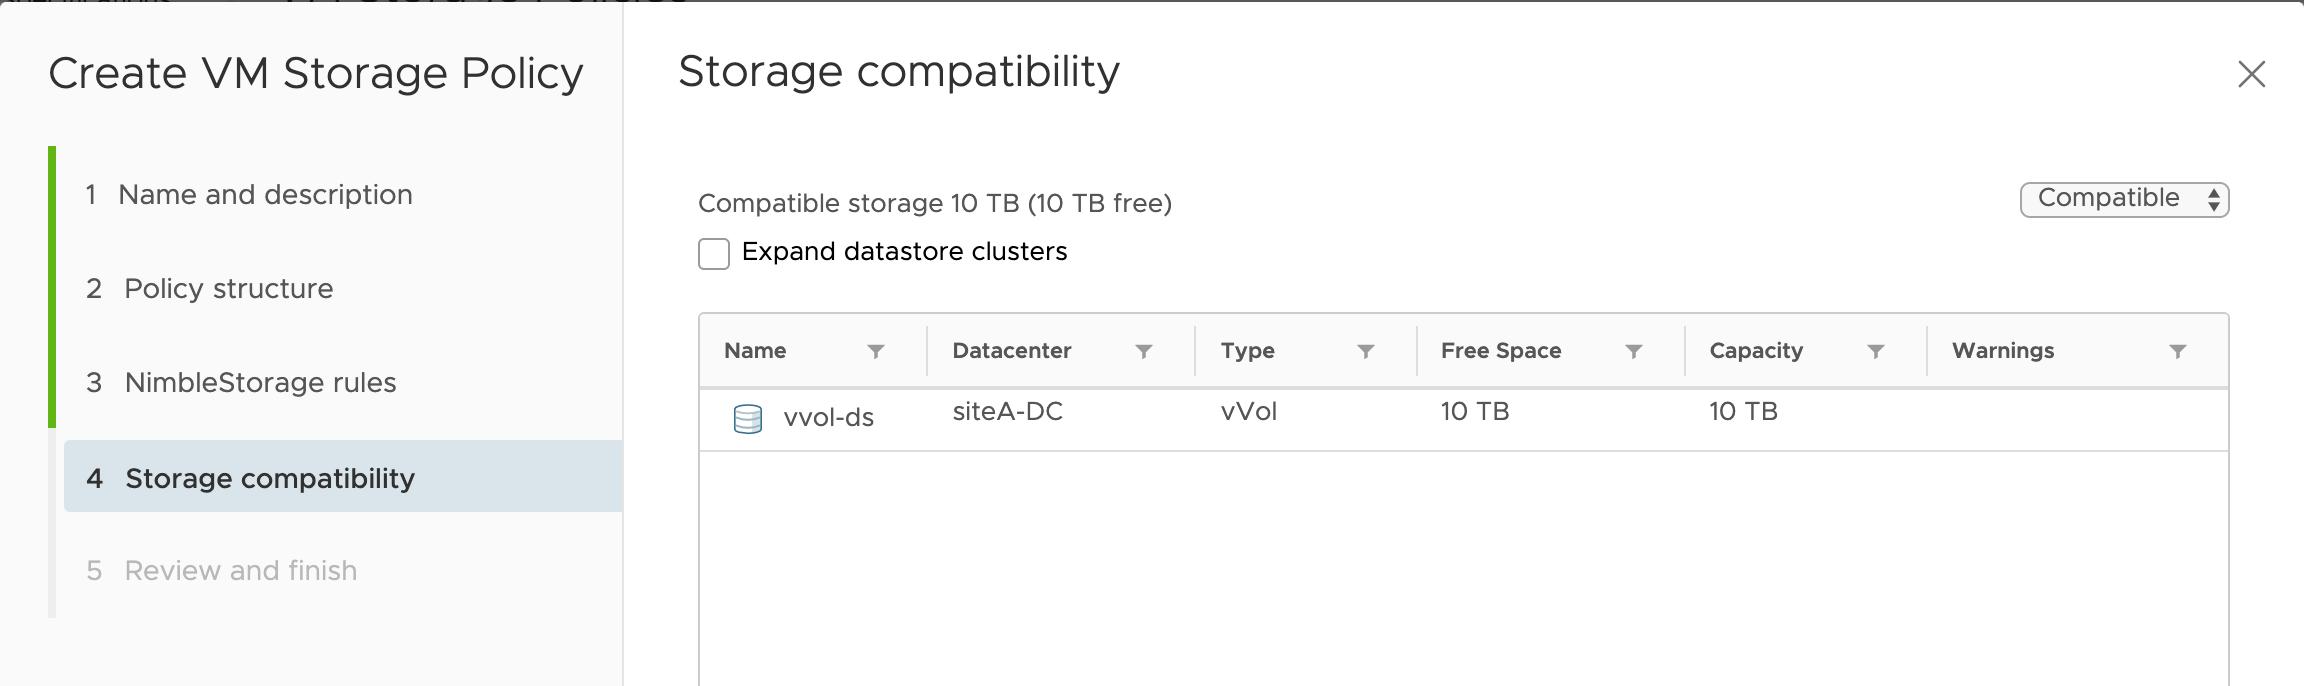 Figure 29: Storage compatibility